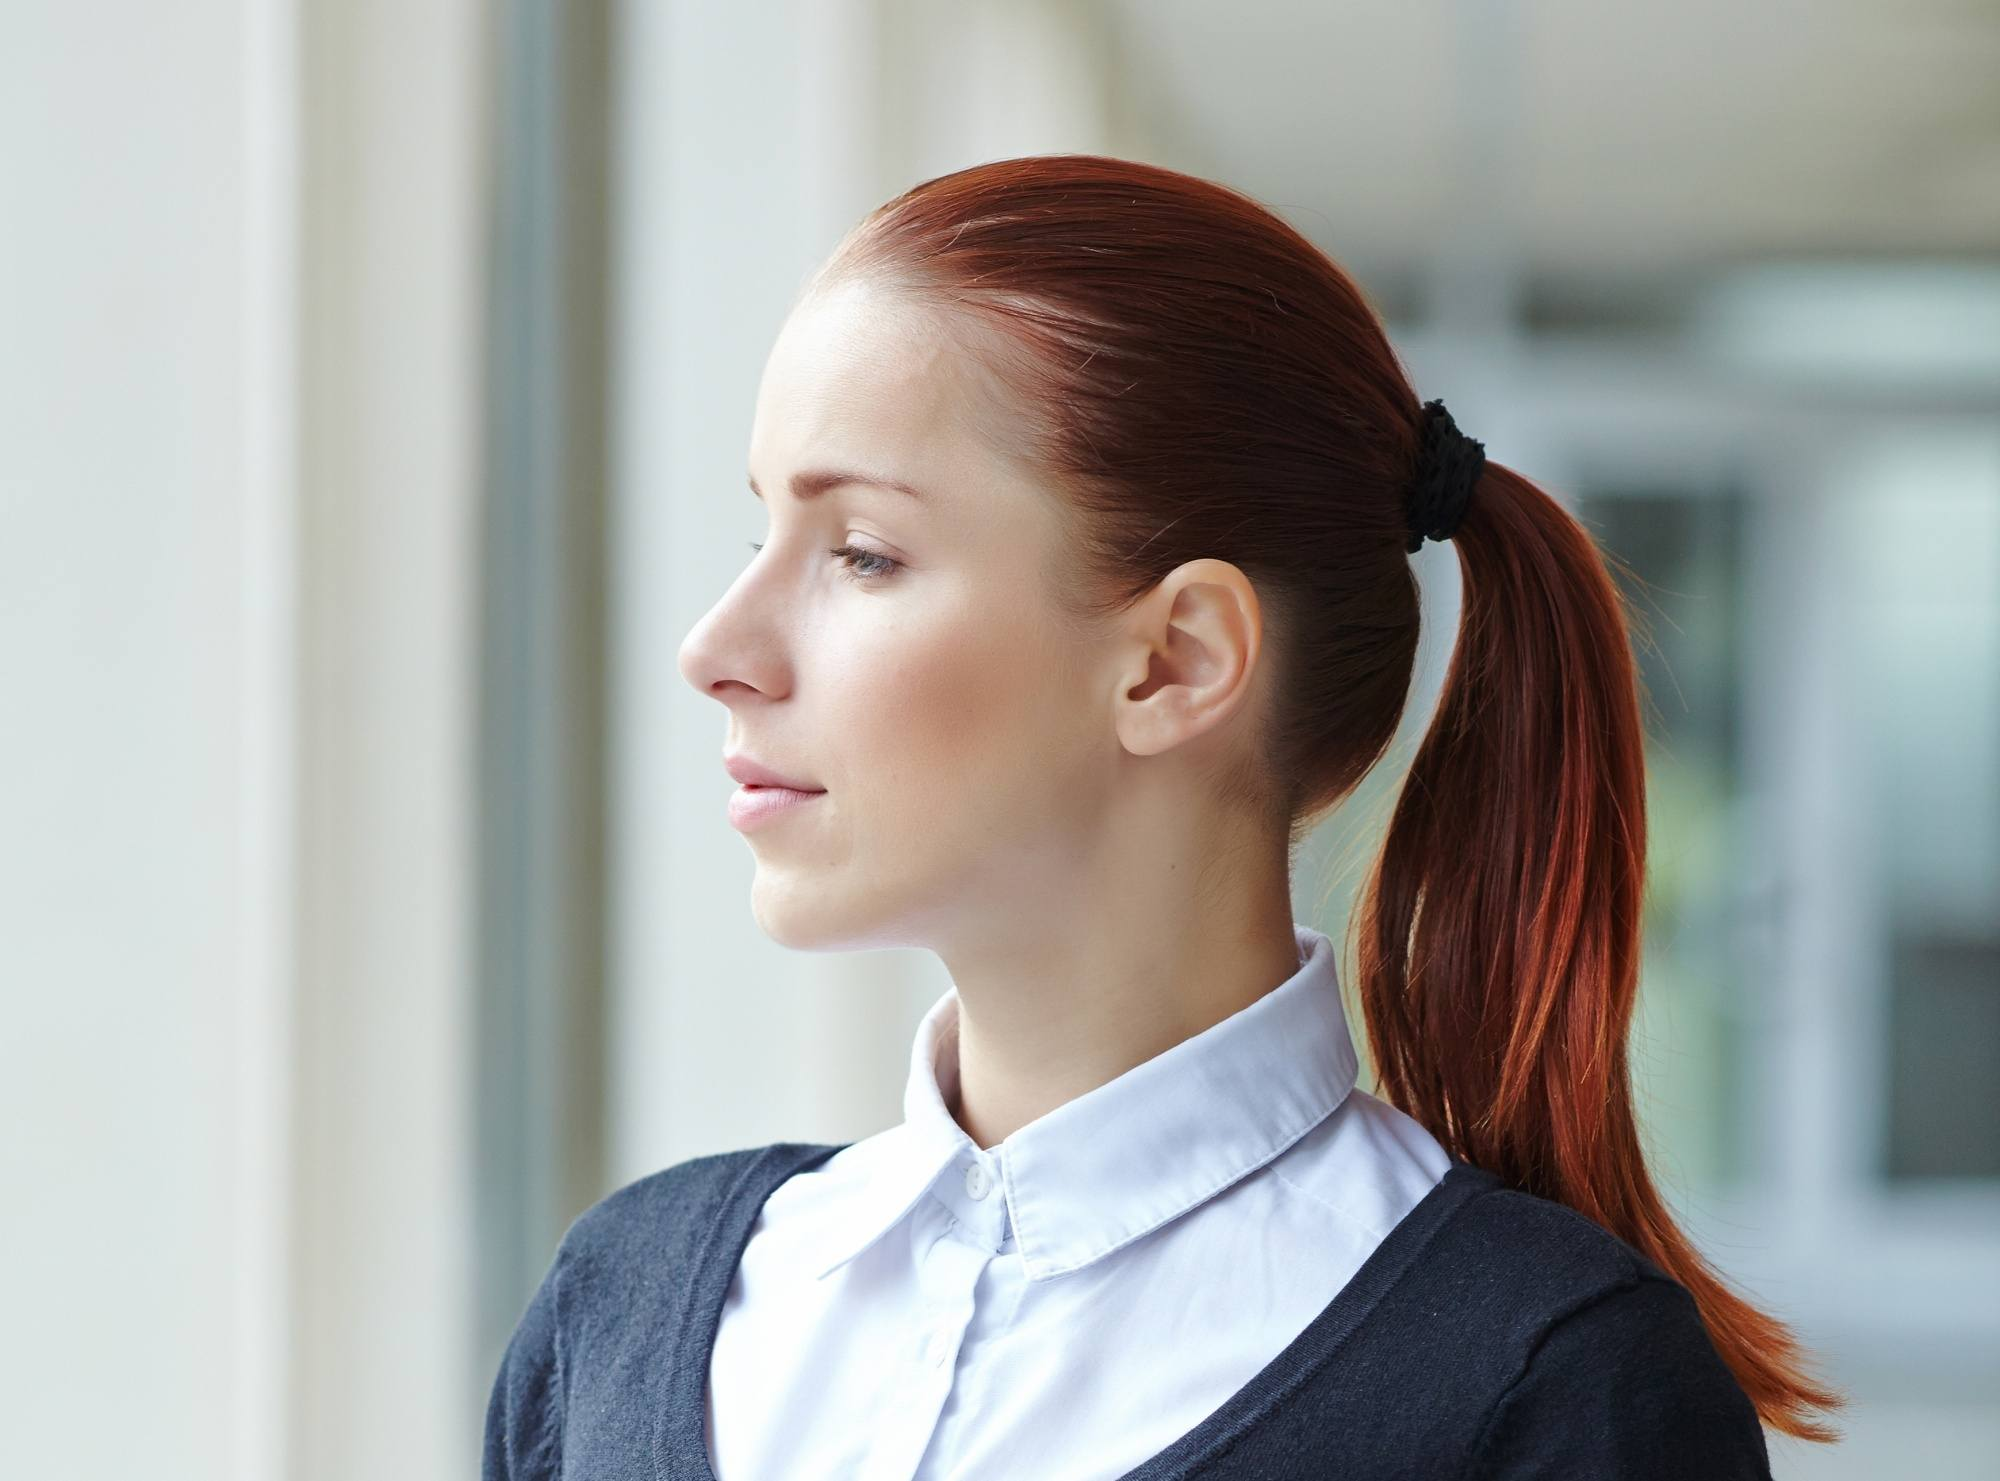 Mahogany hair color: Closeup shot of a woman with long dark hair in a ponytail